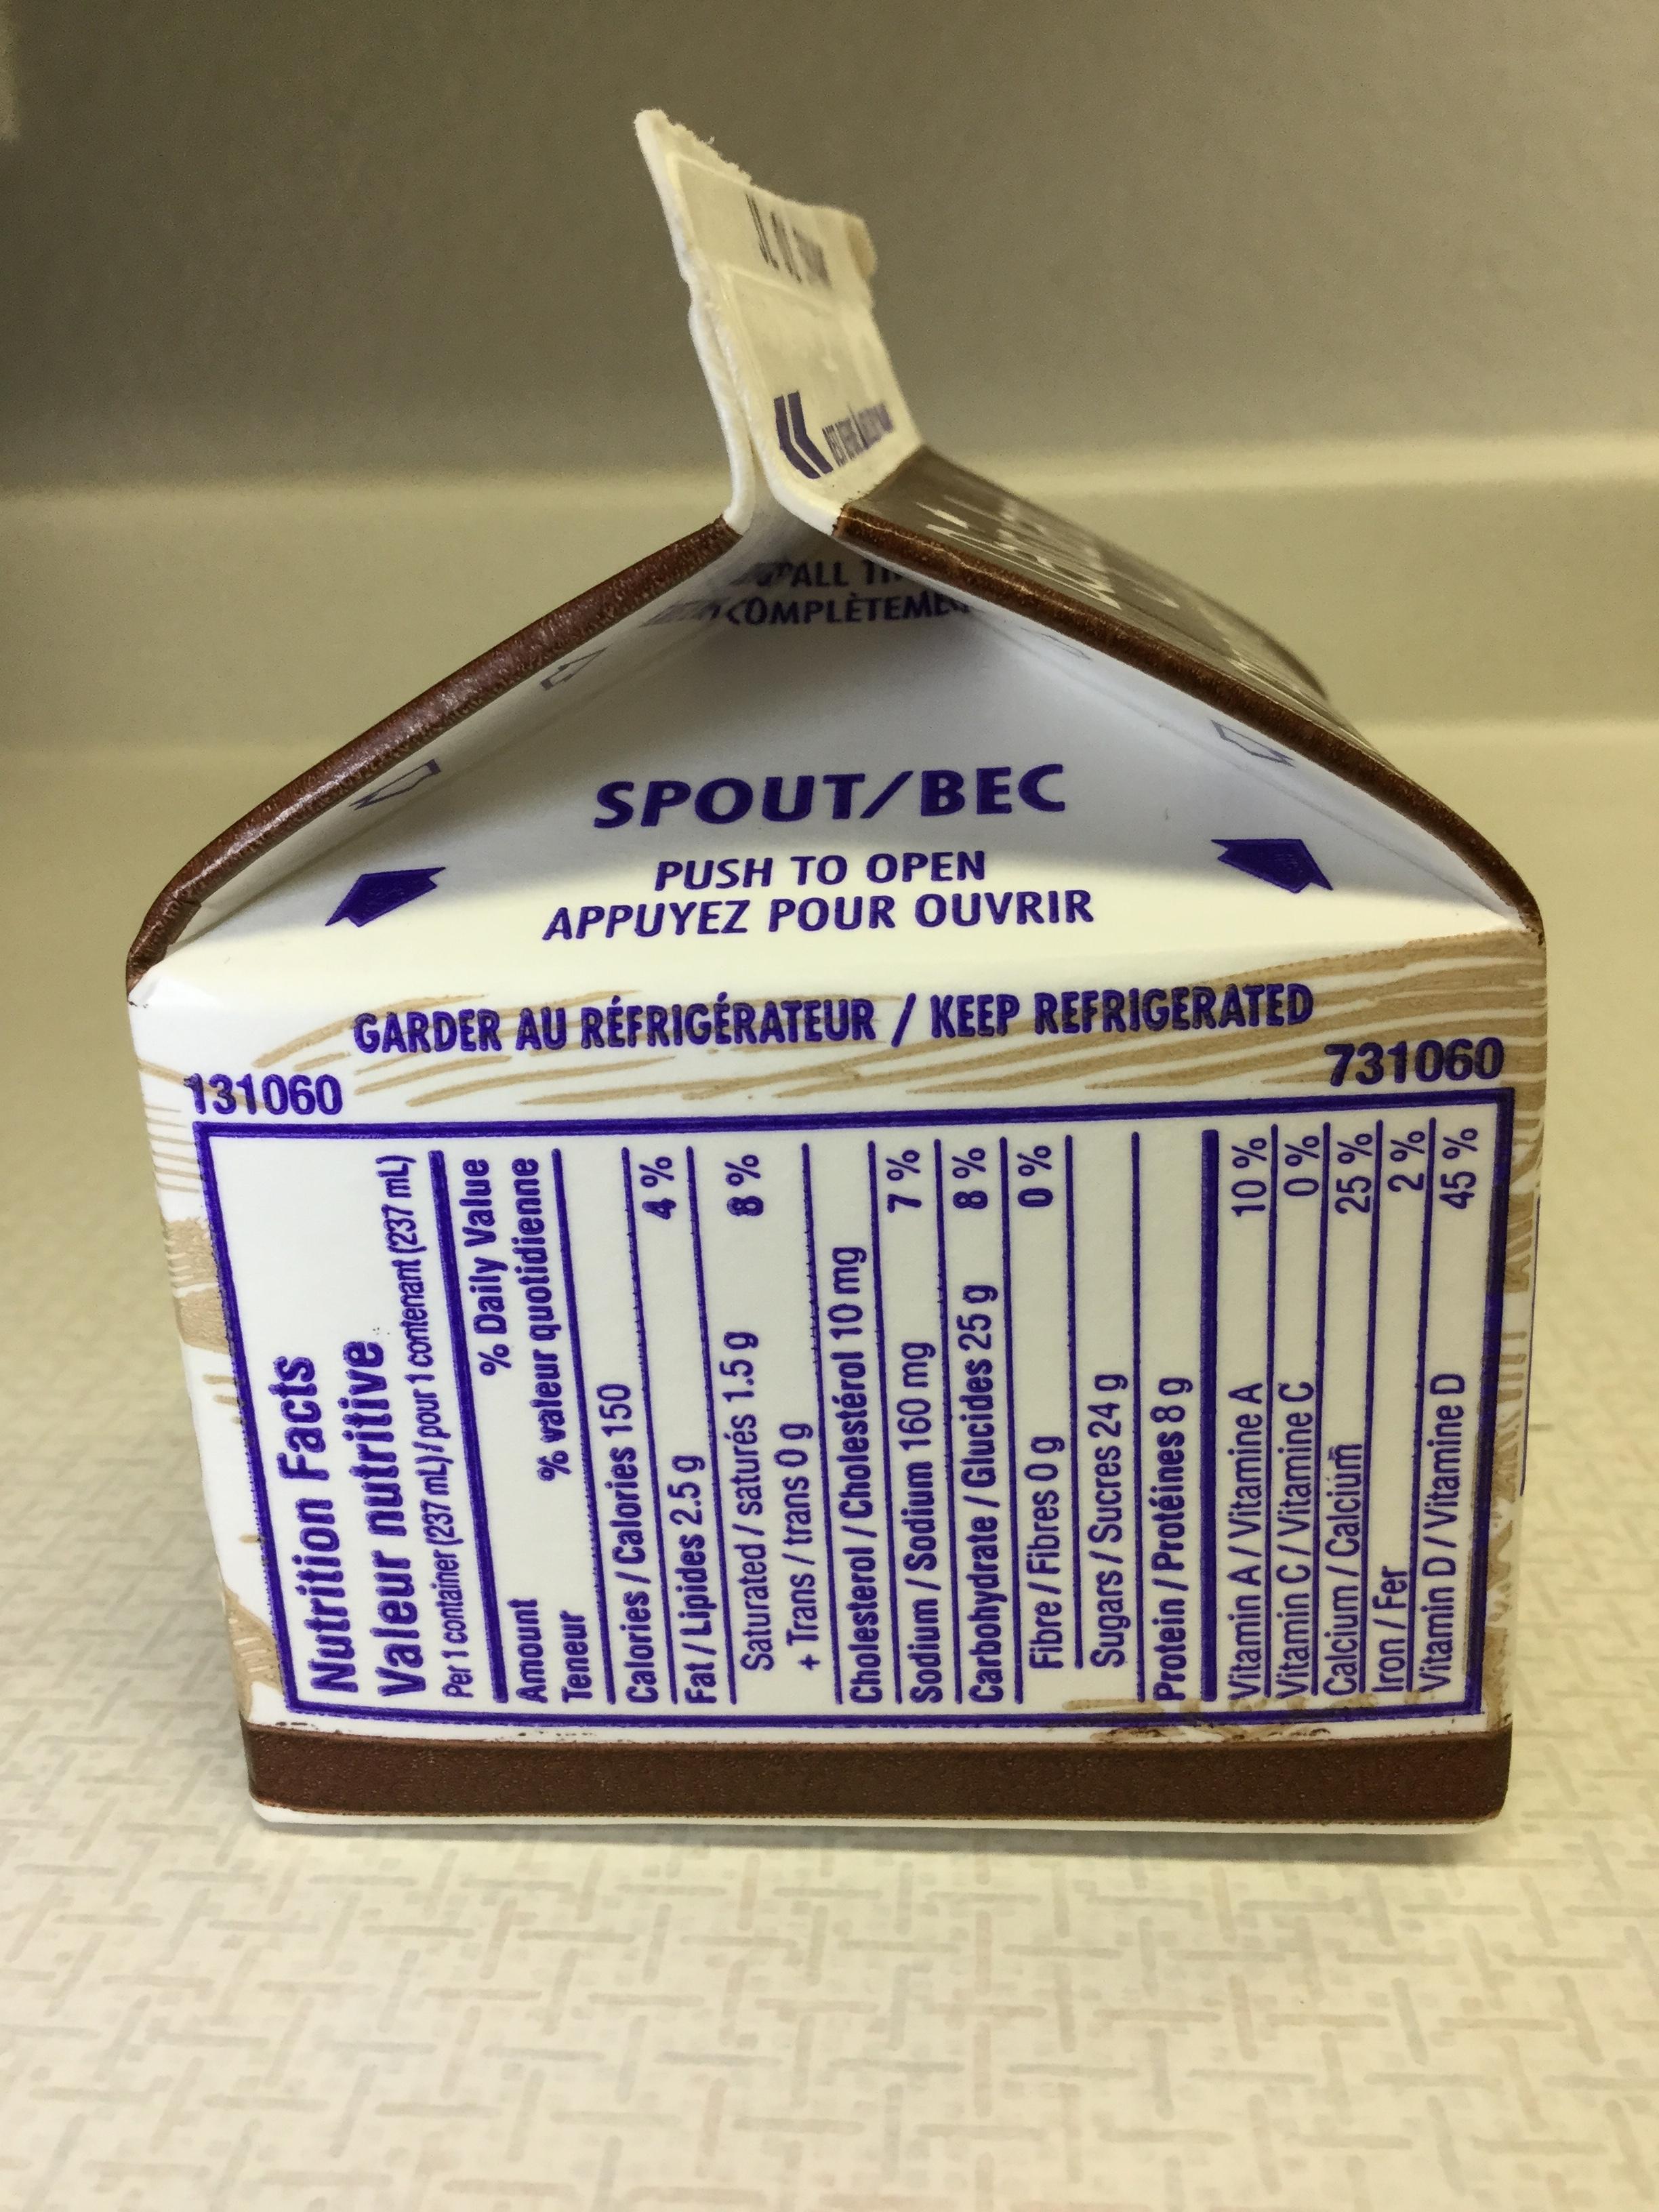 Dairyland Chocolate Partly Skimmed Milk Side 1